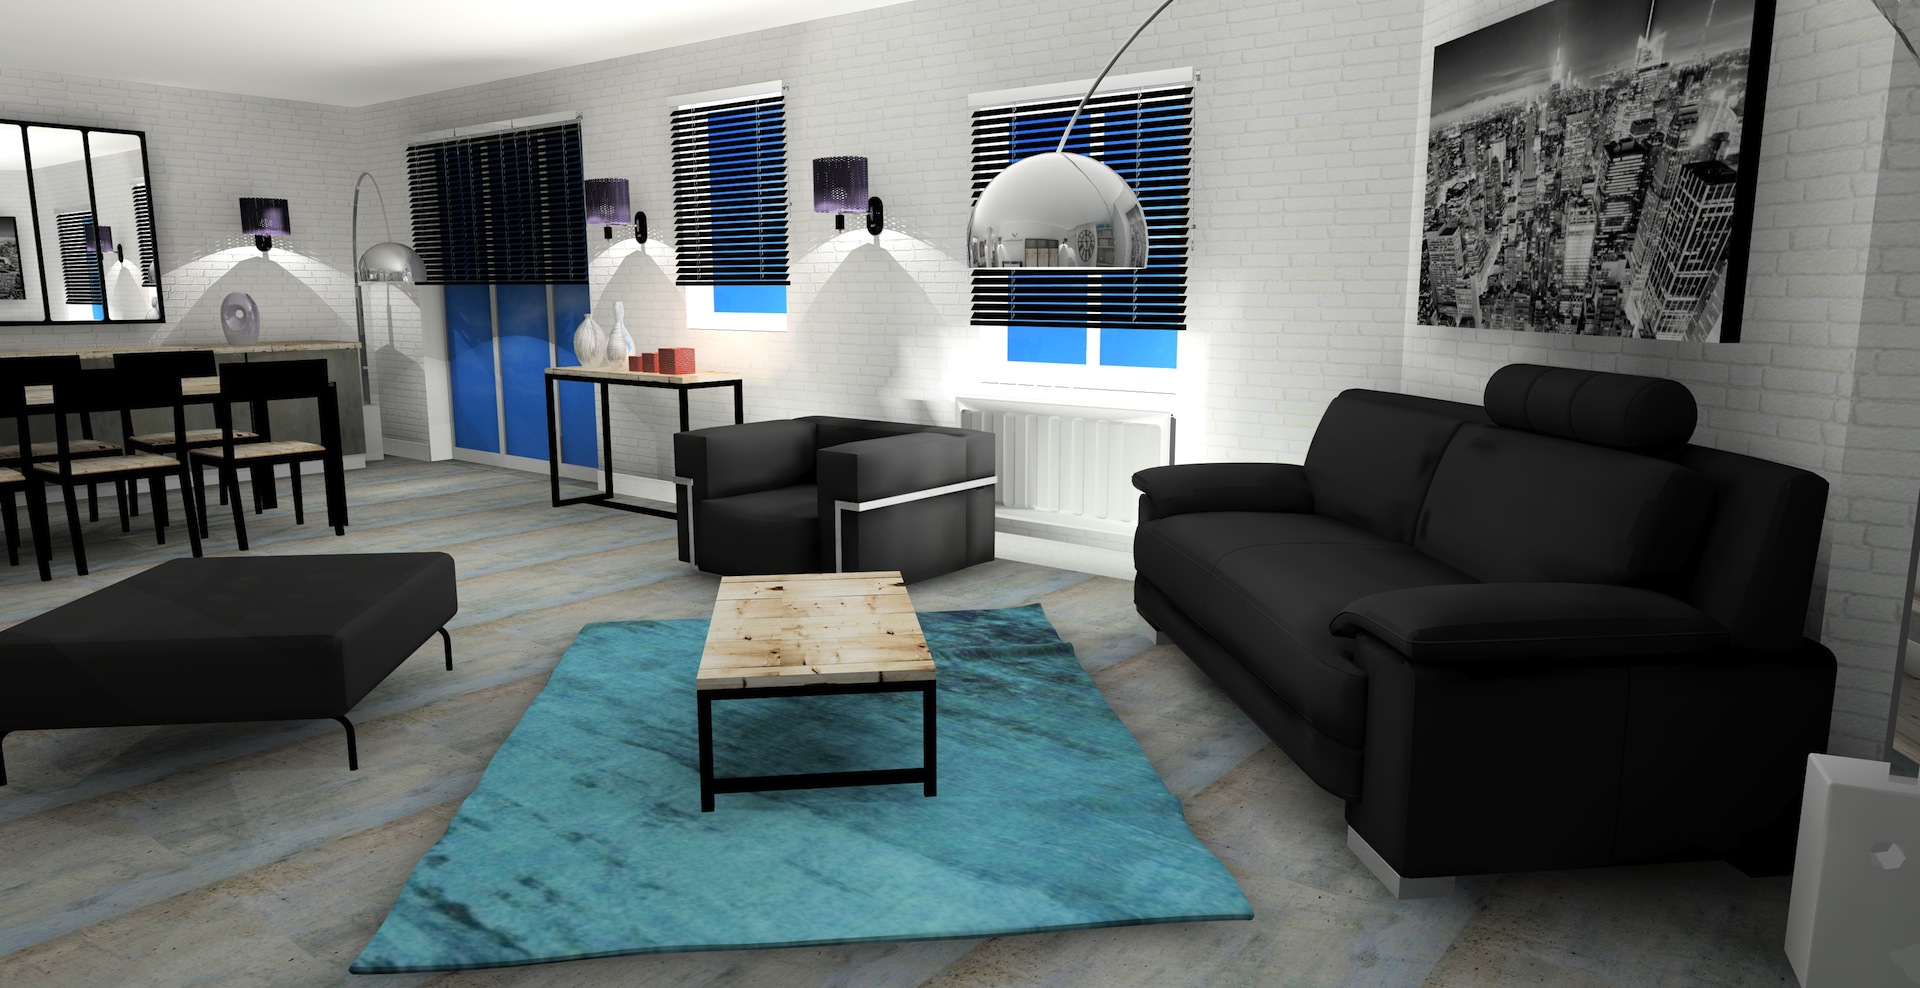 sandrine bertin d coratrice architecte d 39 int rieur reims. Black Bedroom Furniture Sets. Home Design Ideas